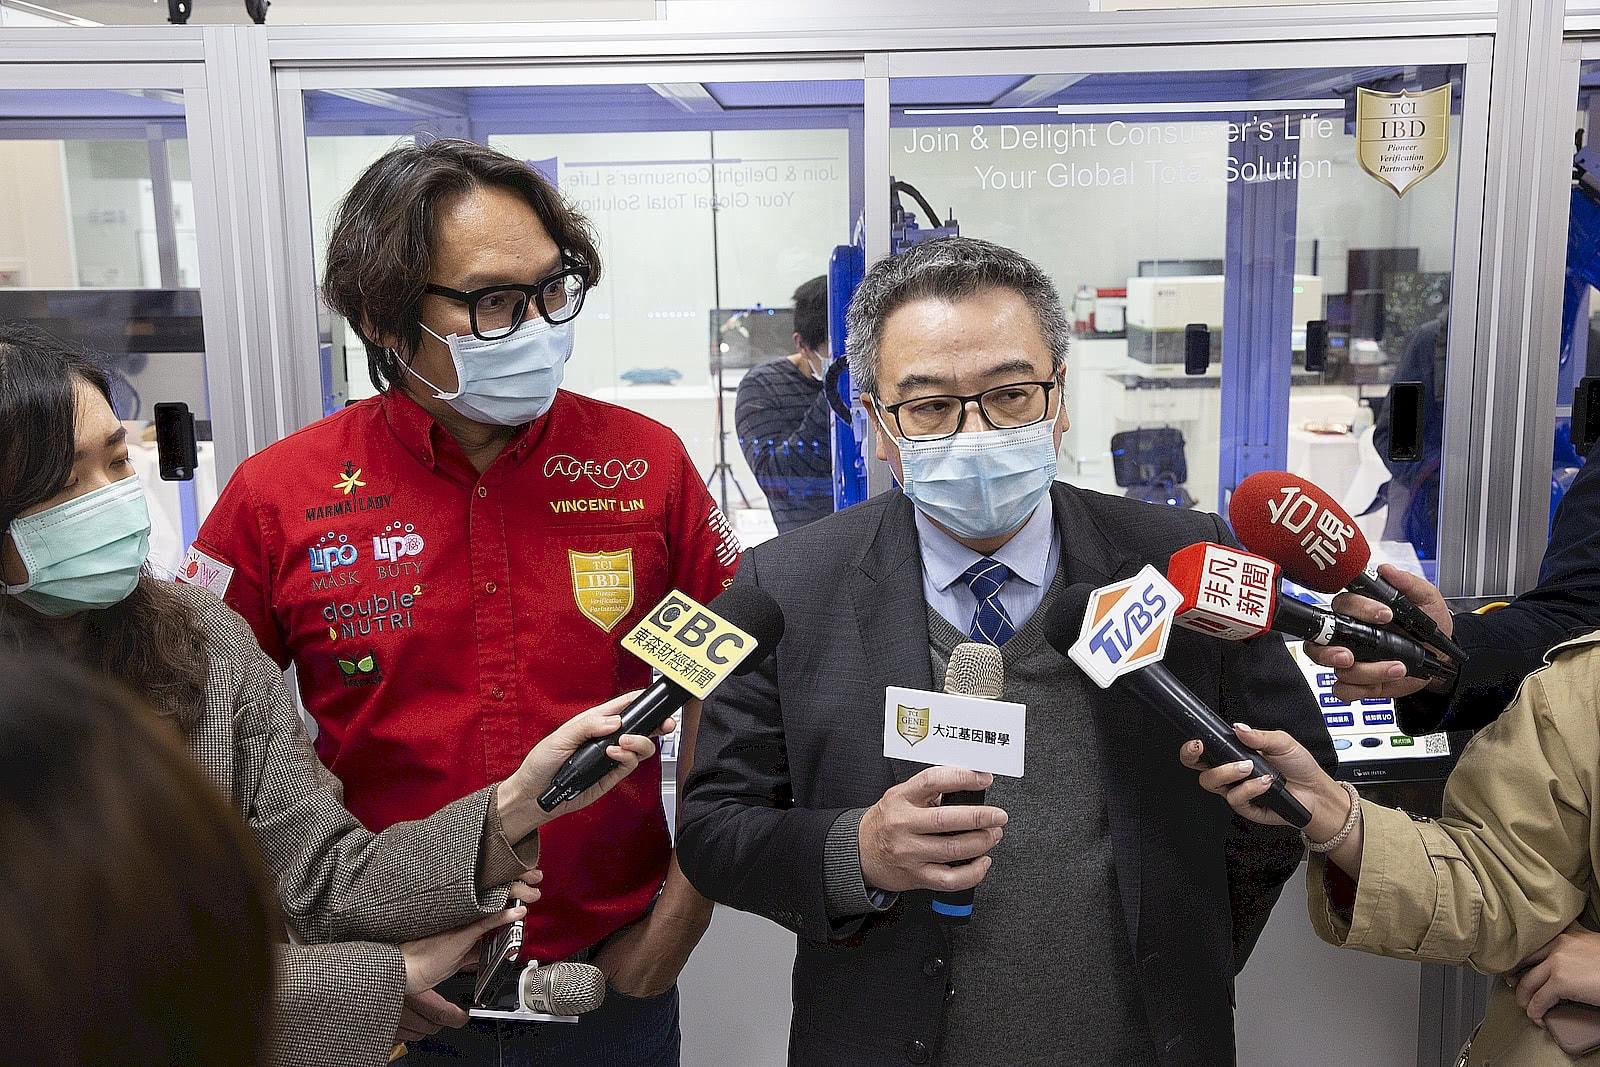 TCI 大江生医如何做到既「快速」又「精确」的新冠肺炎检测?